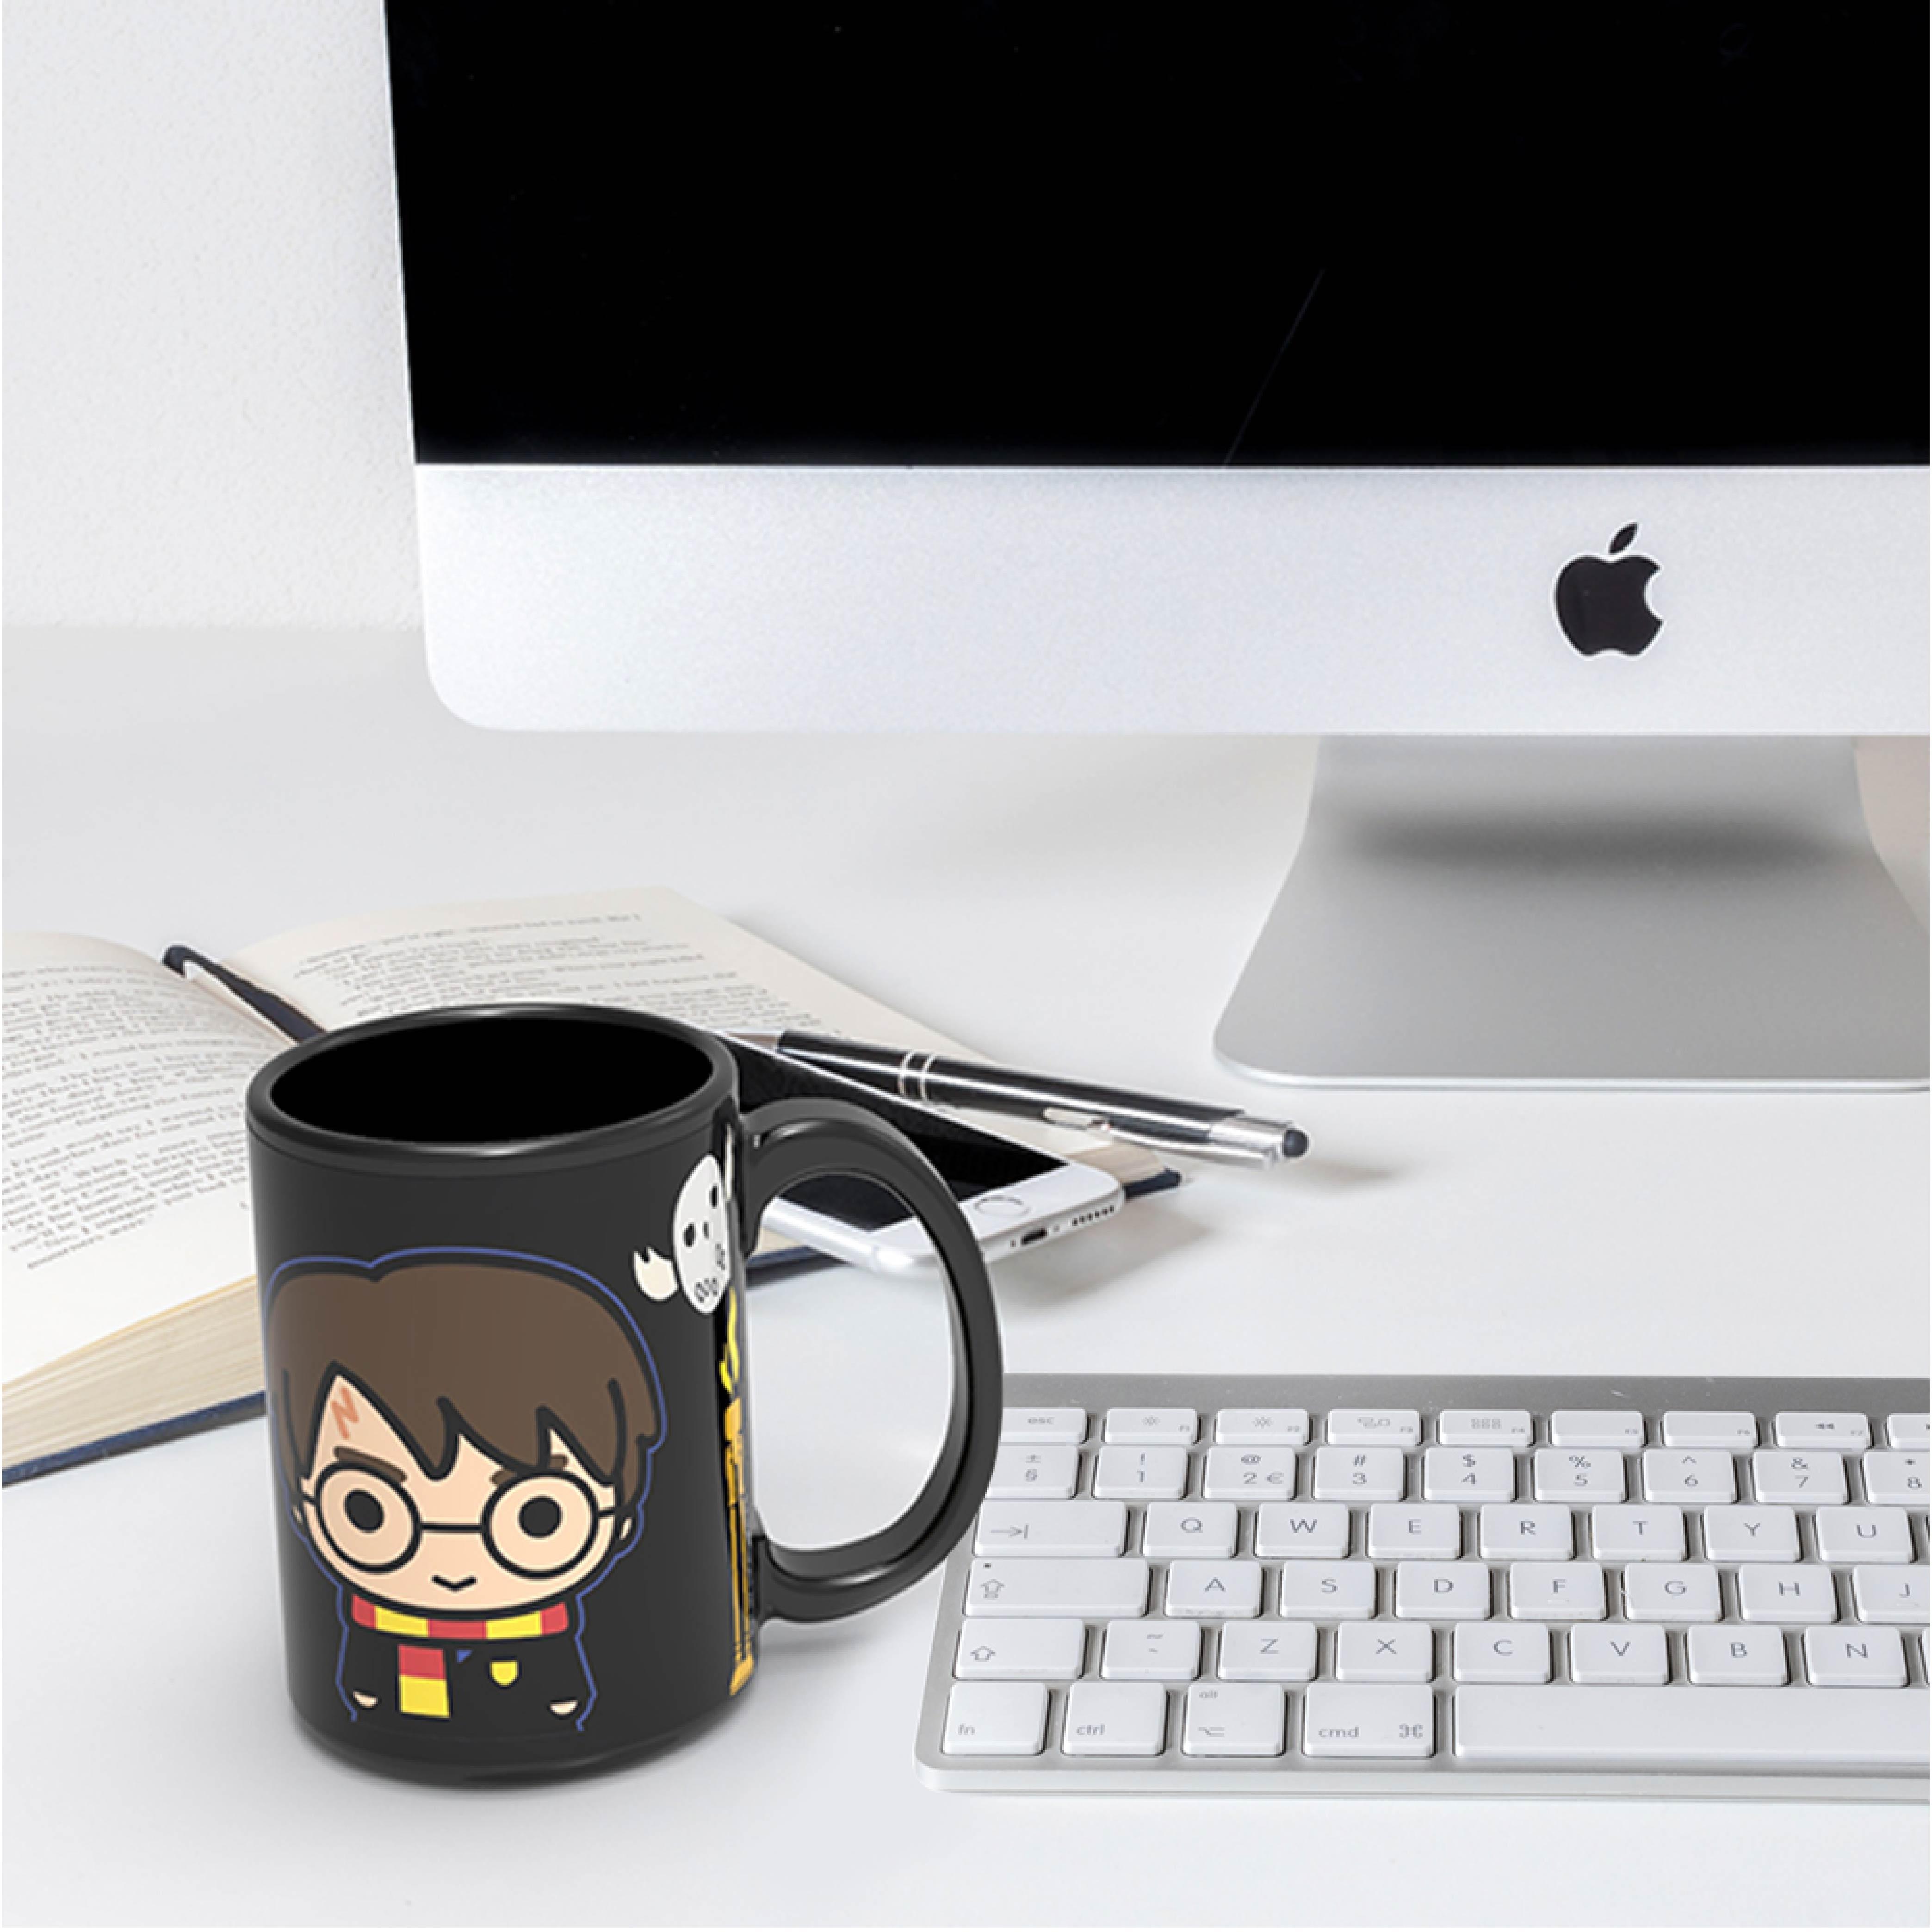 Harry Potter 15 oz. Coffee Mug, The Sorcerer's Stone slideshow image 15